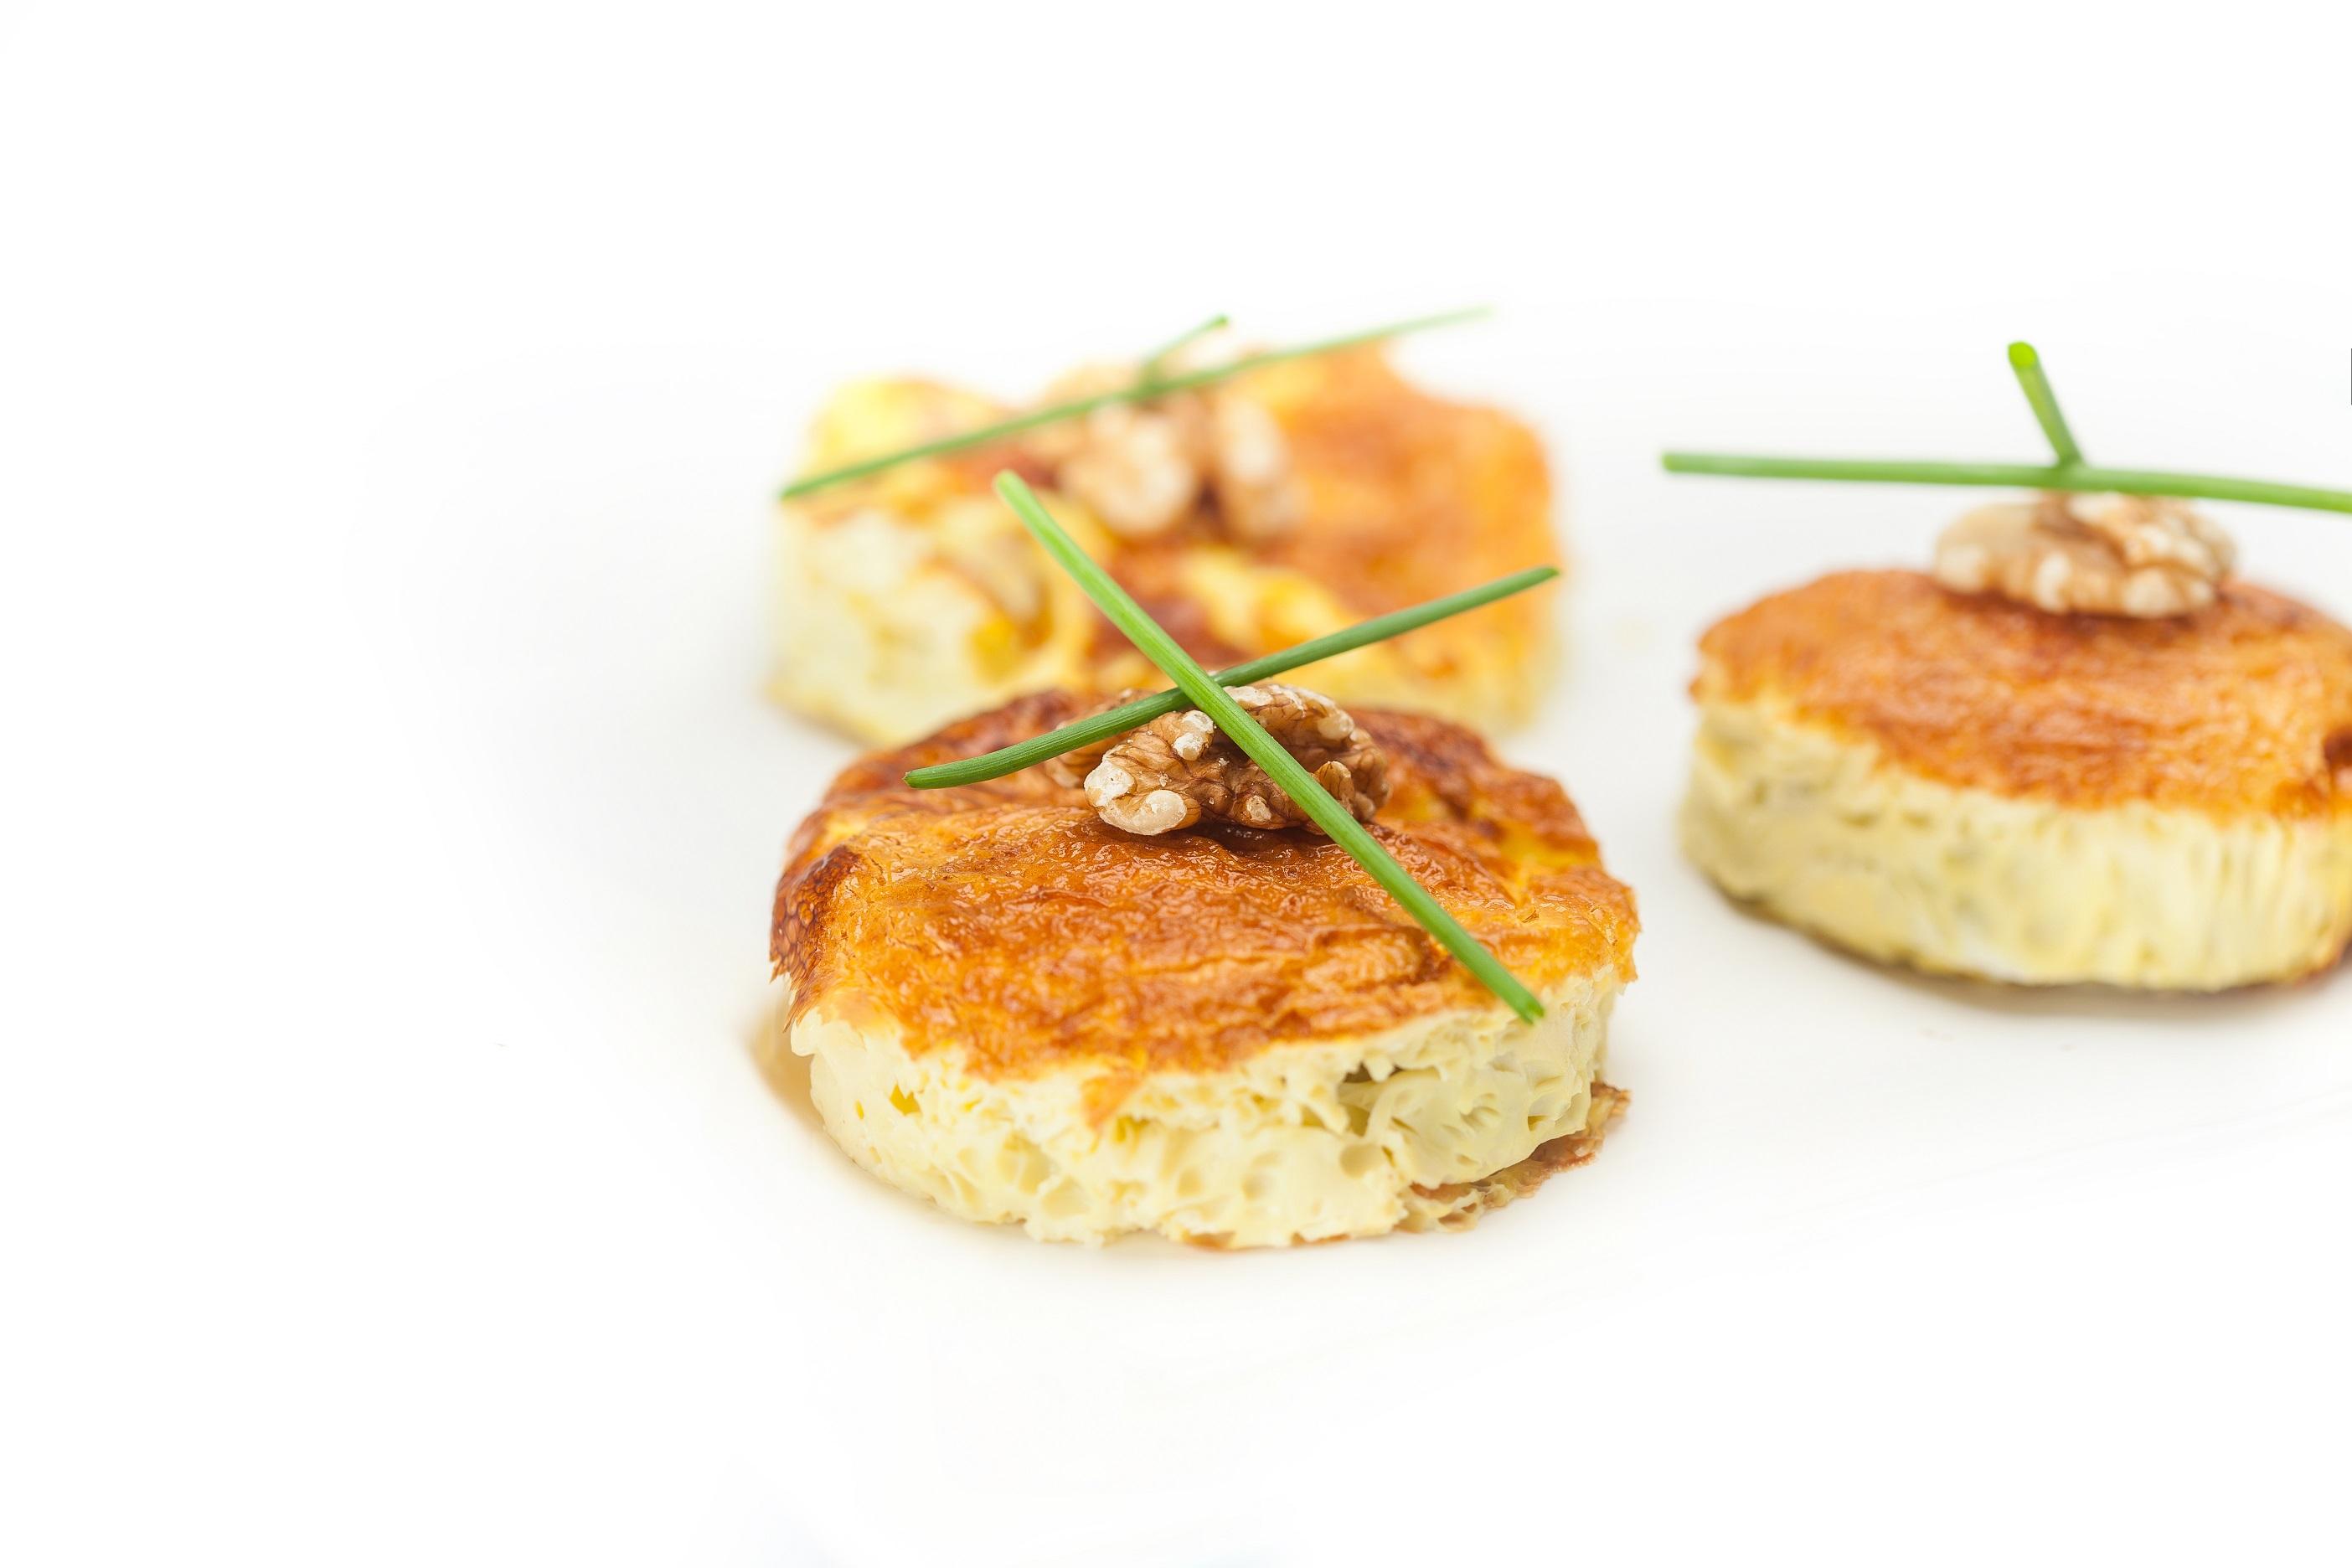 Kolački s sirom Grana Padano in orehi